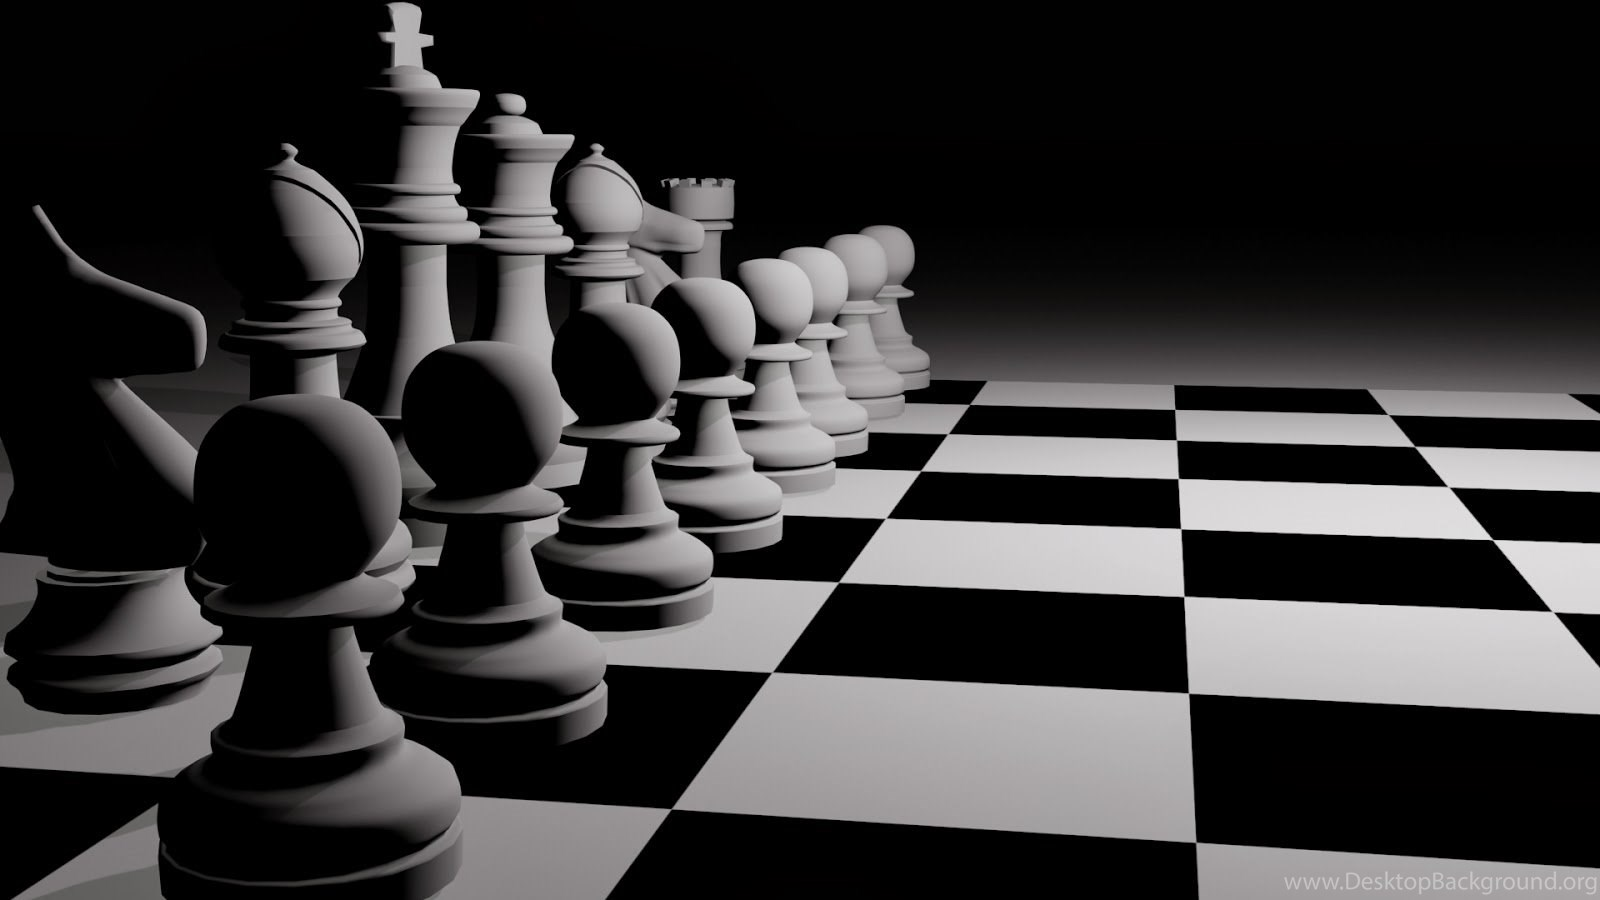 Chess Wallpapers HD Wallpapermonkey Desktop Background